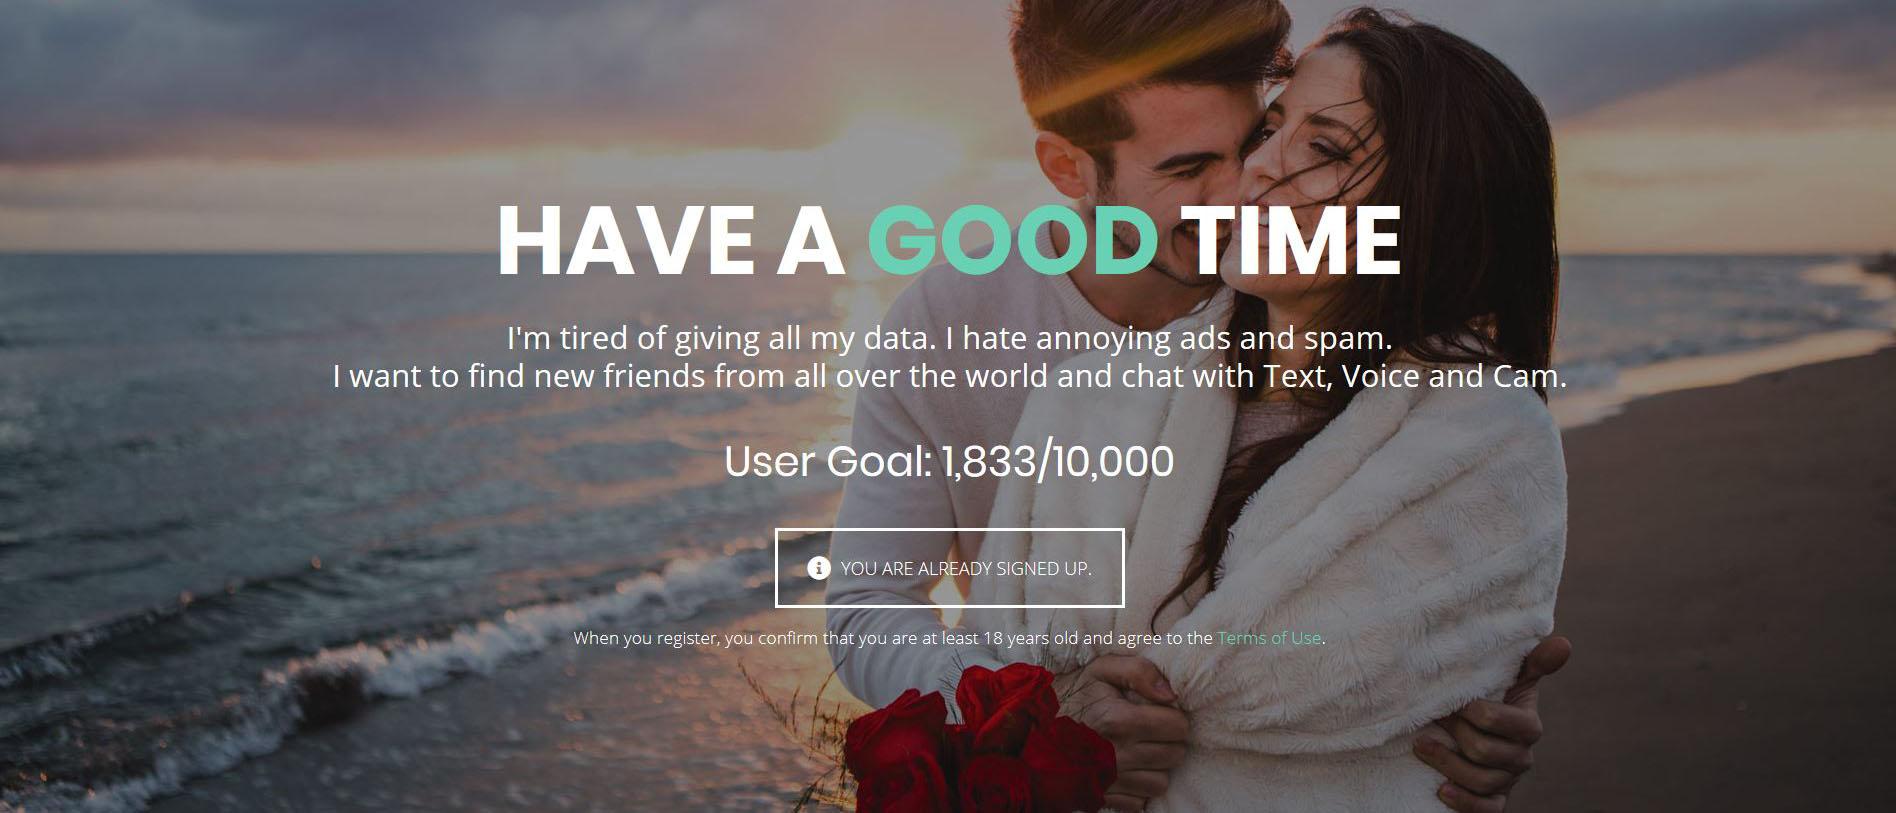 International dating site elite